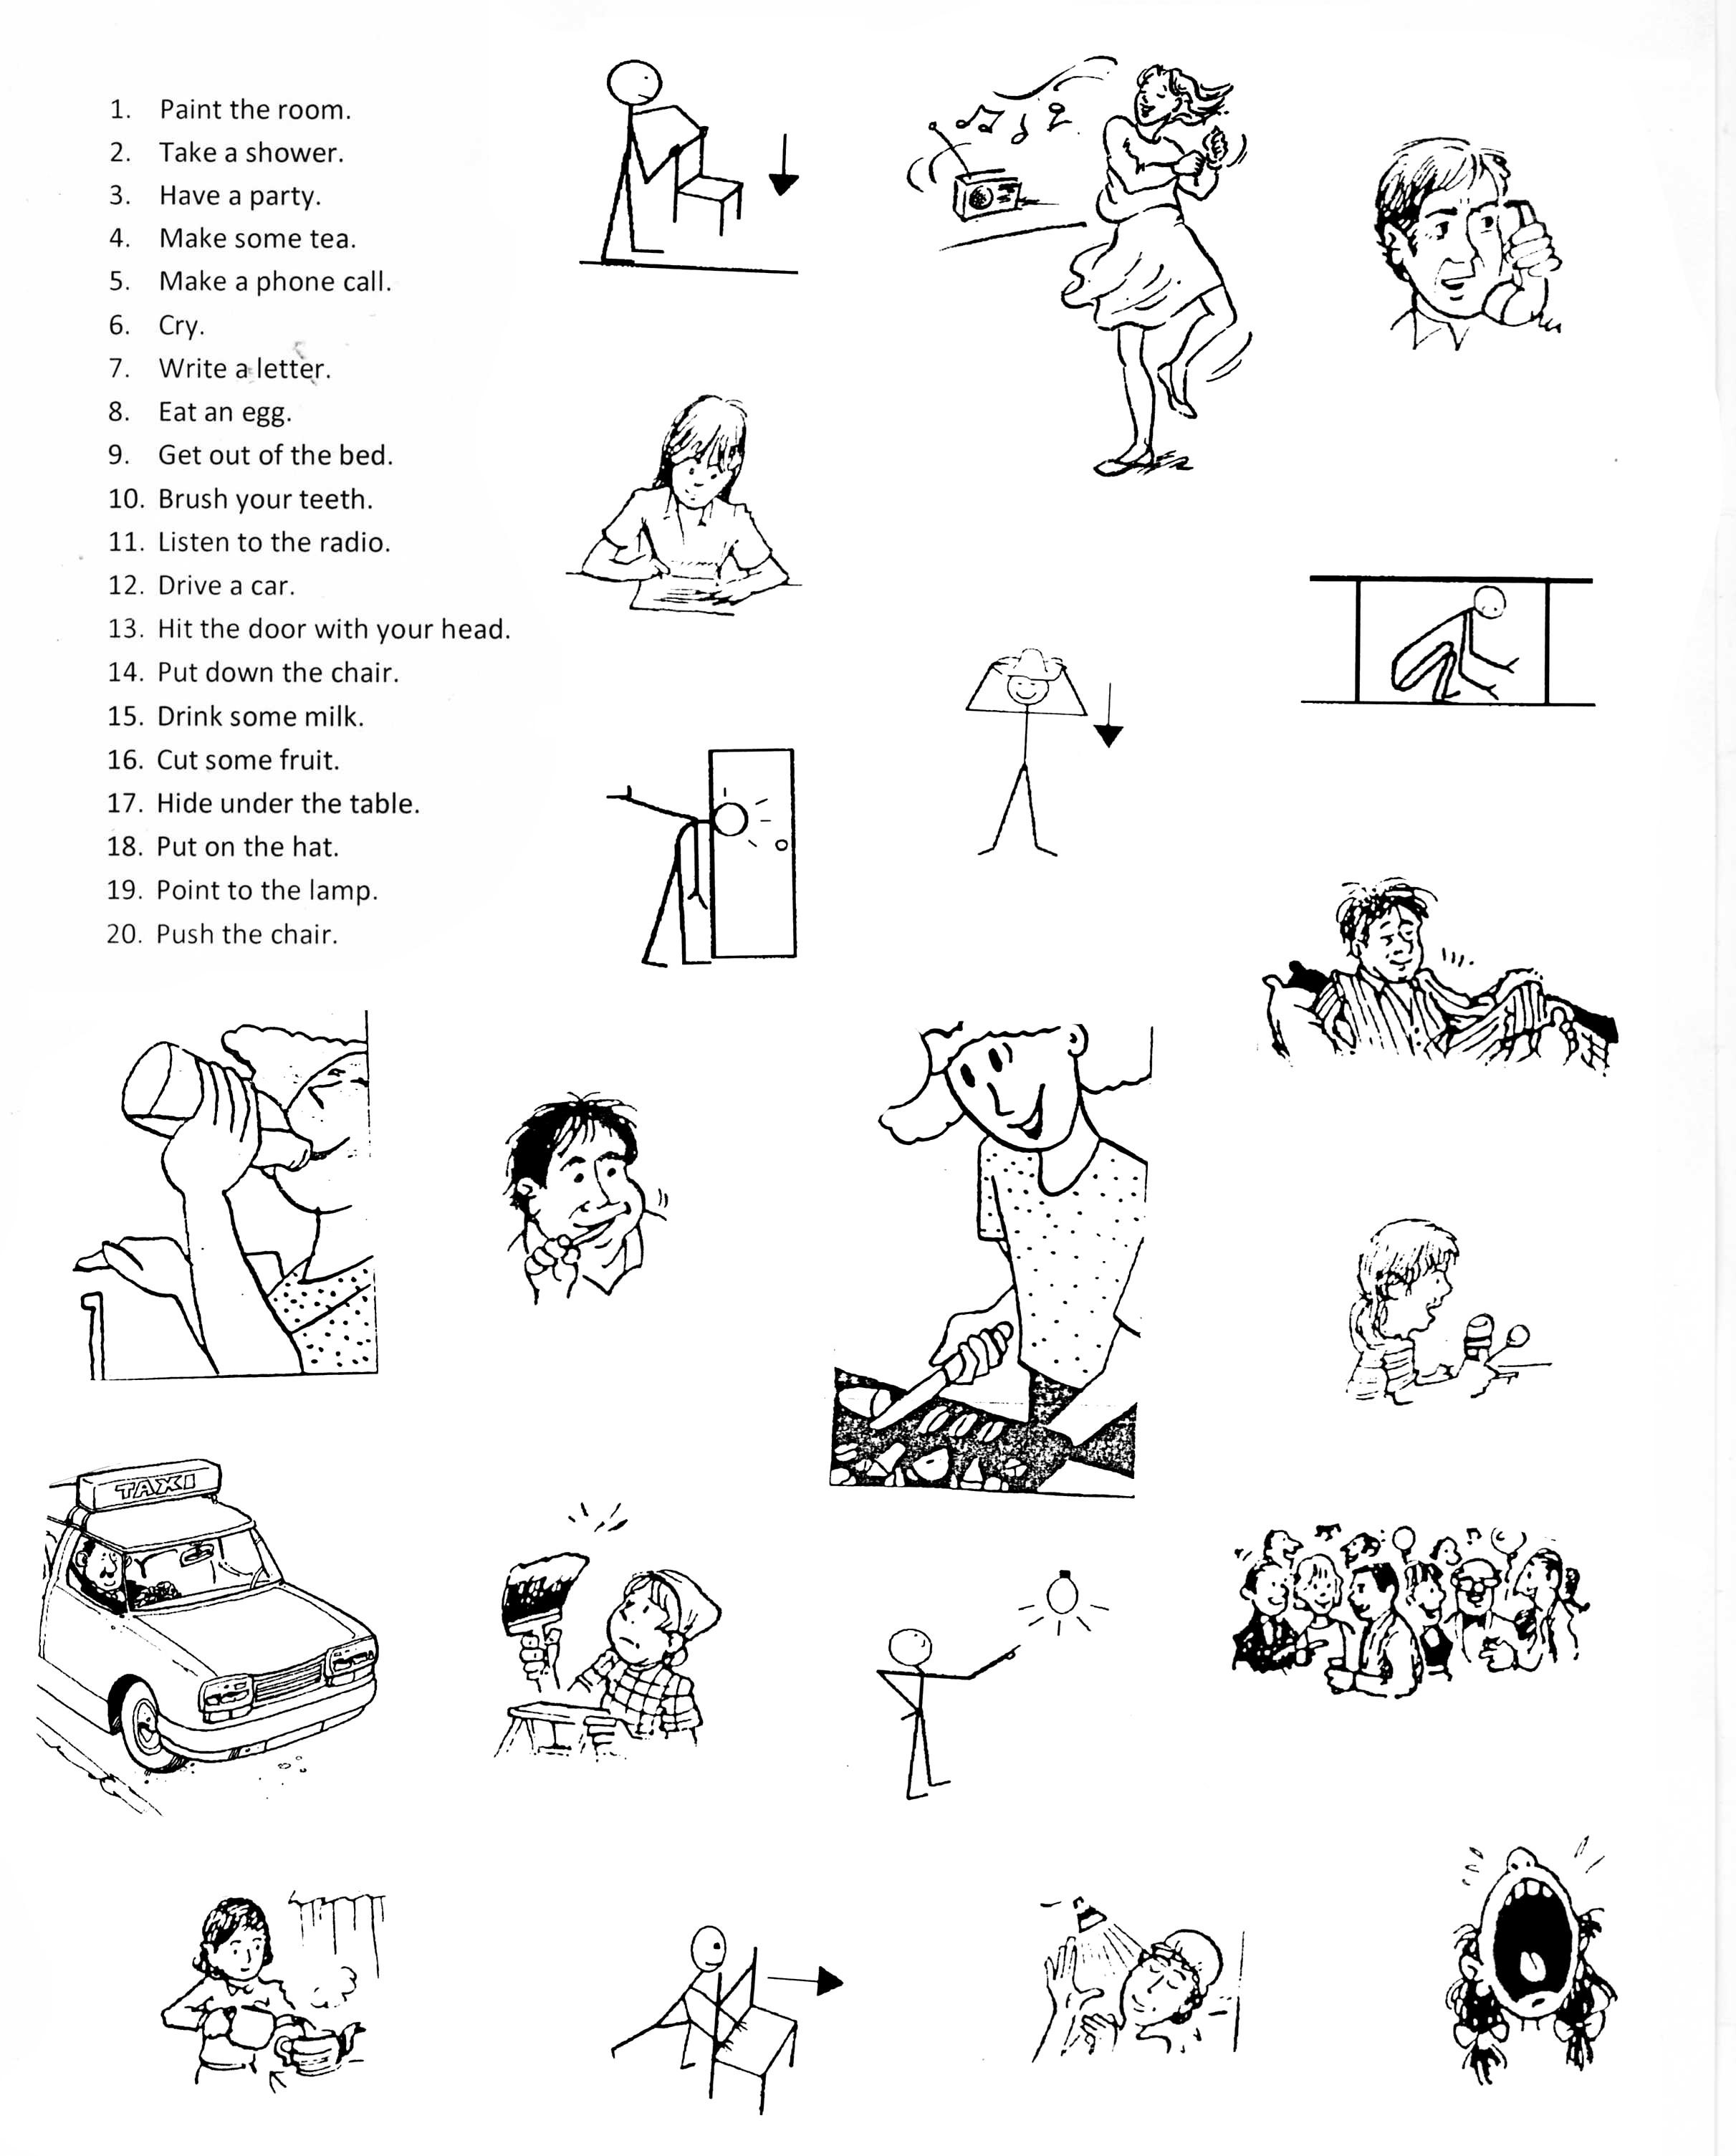 Irregular Verbs Worksheet For Adults